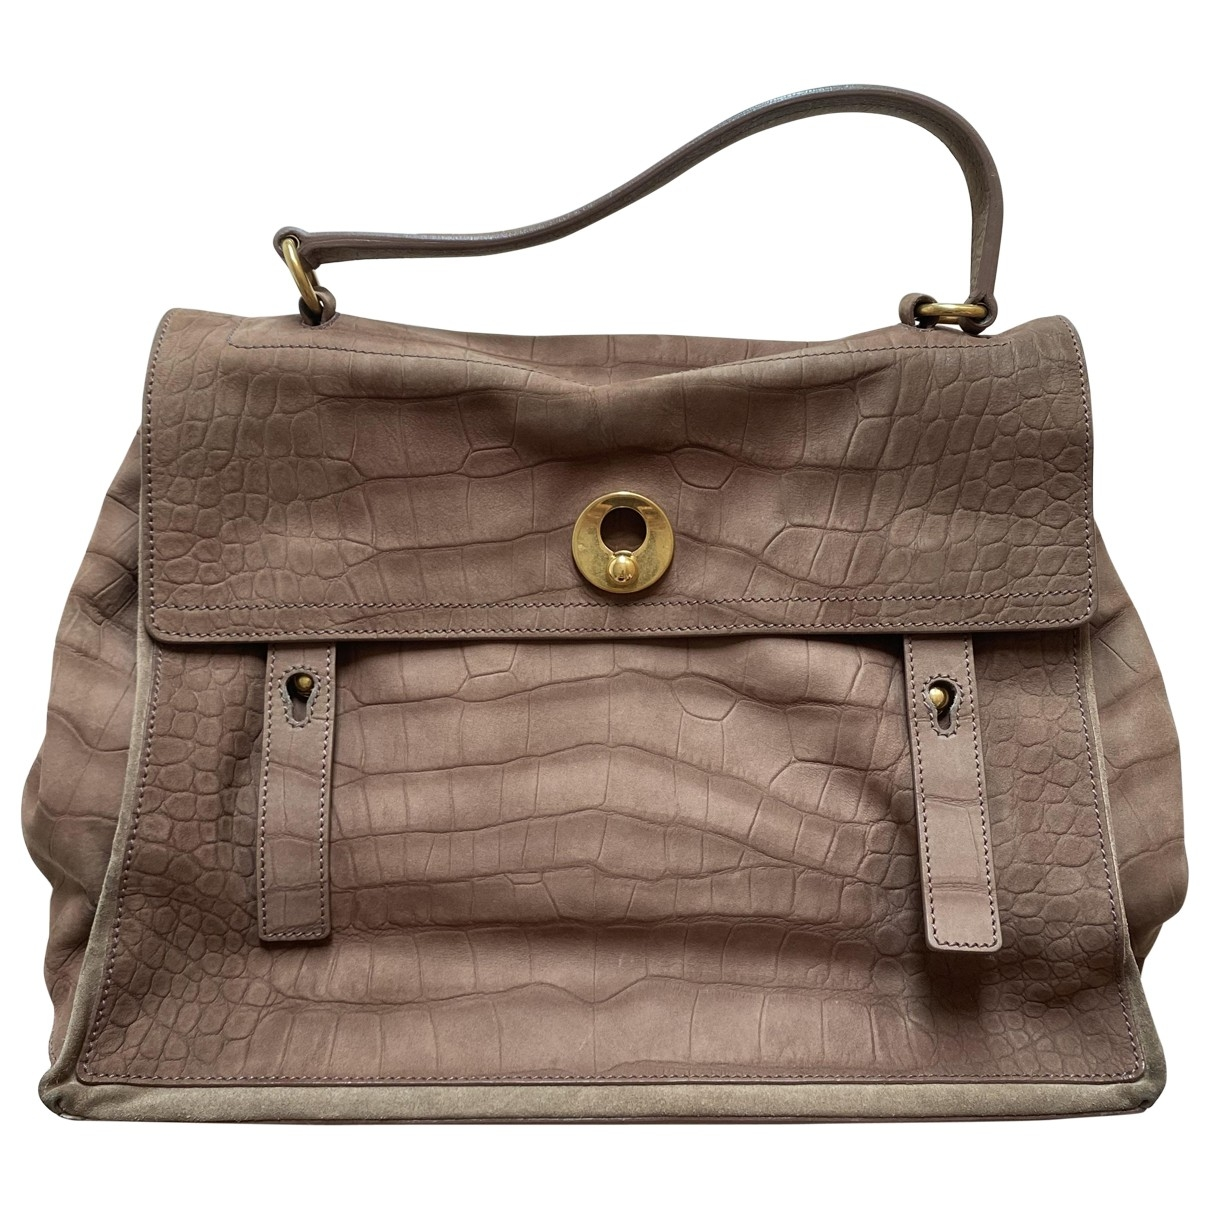 Yves Saint Laurent Muse Two Brown Leather handbag for Women \N